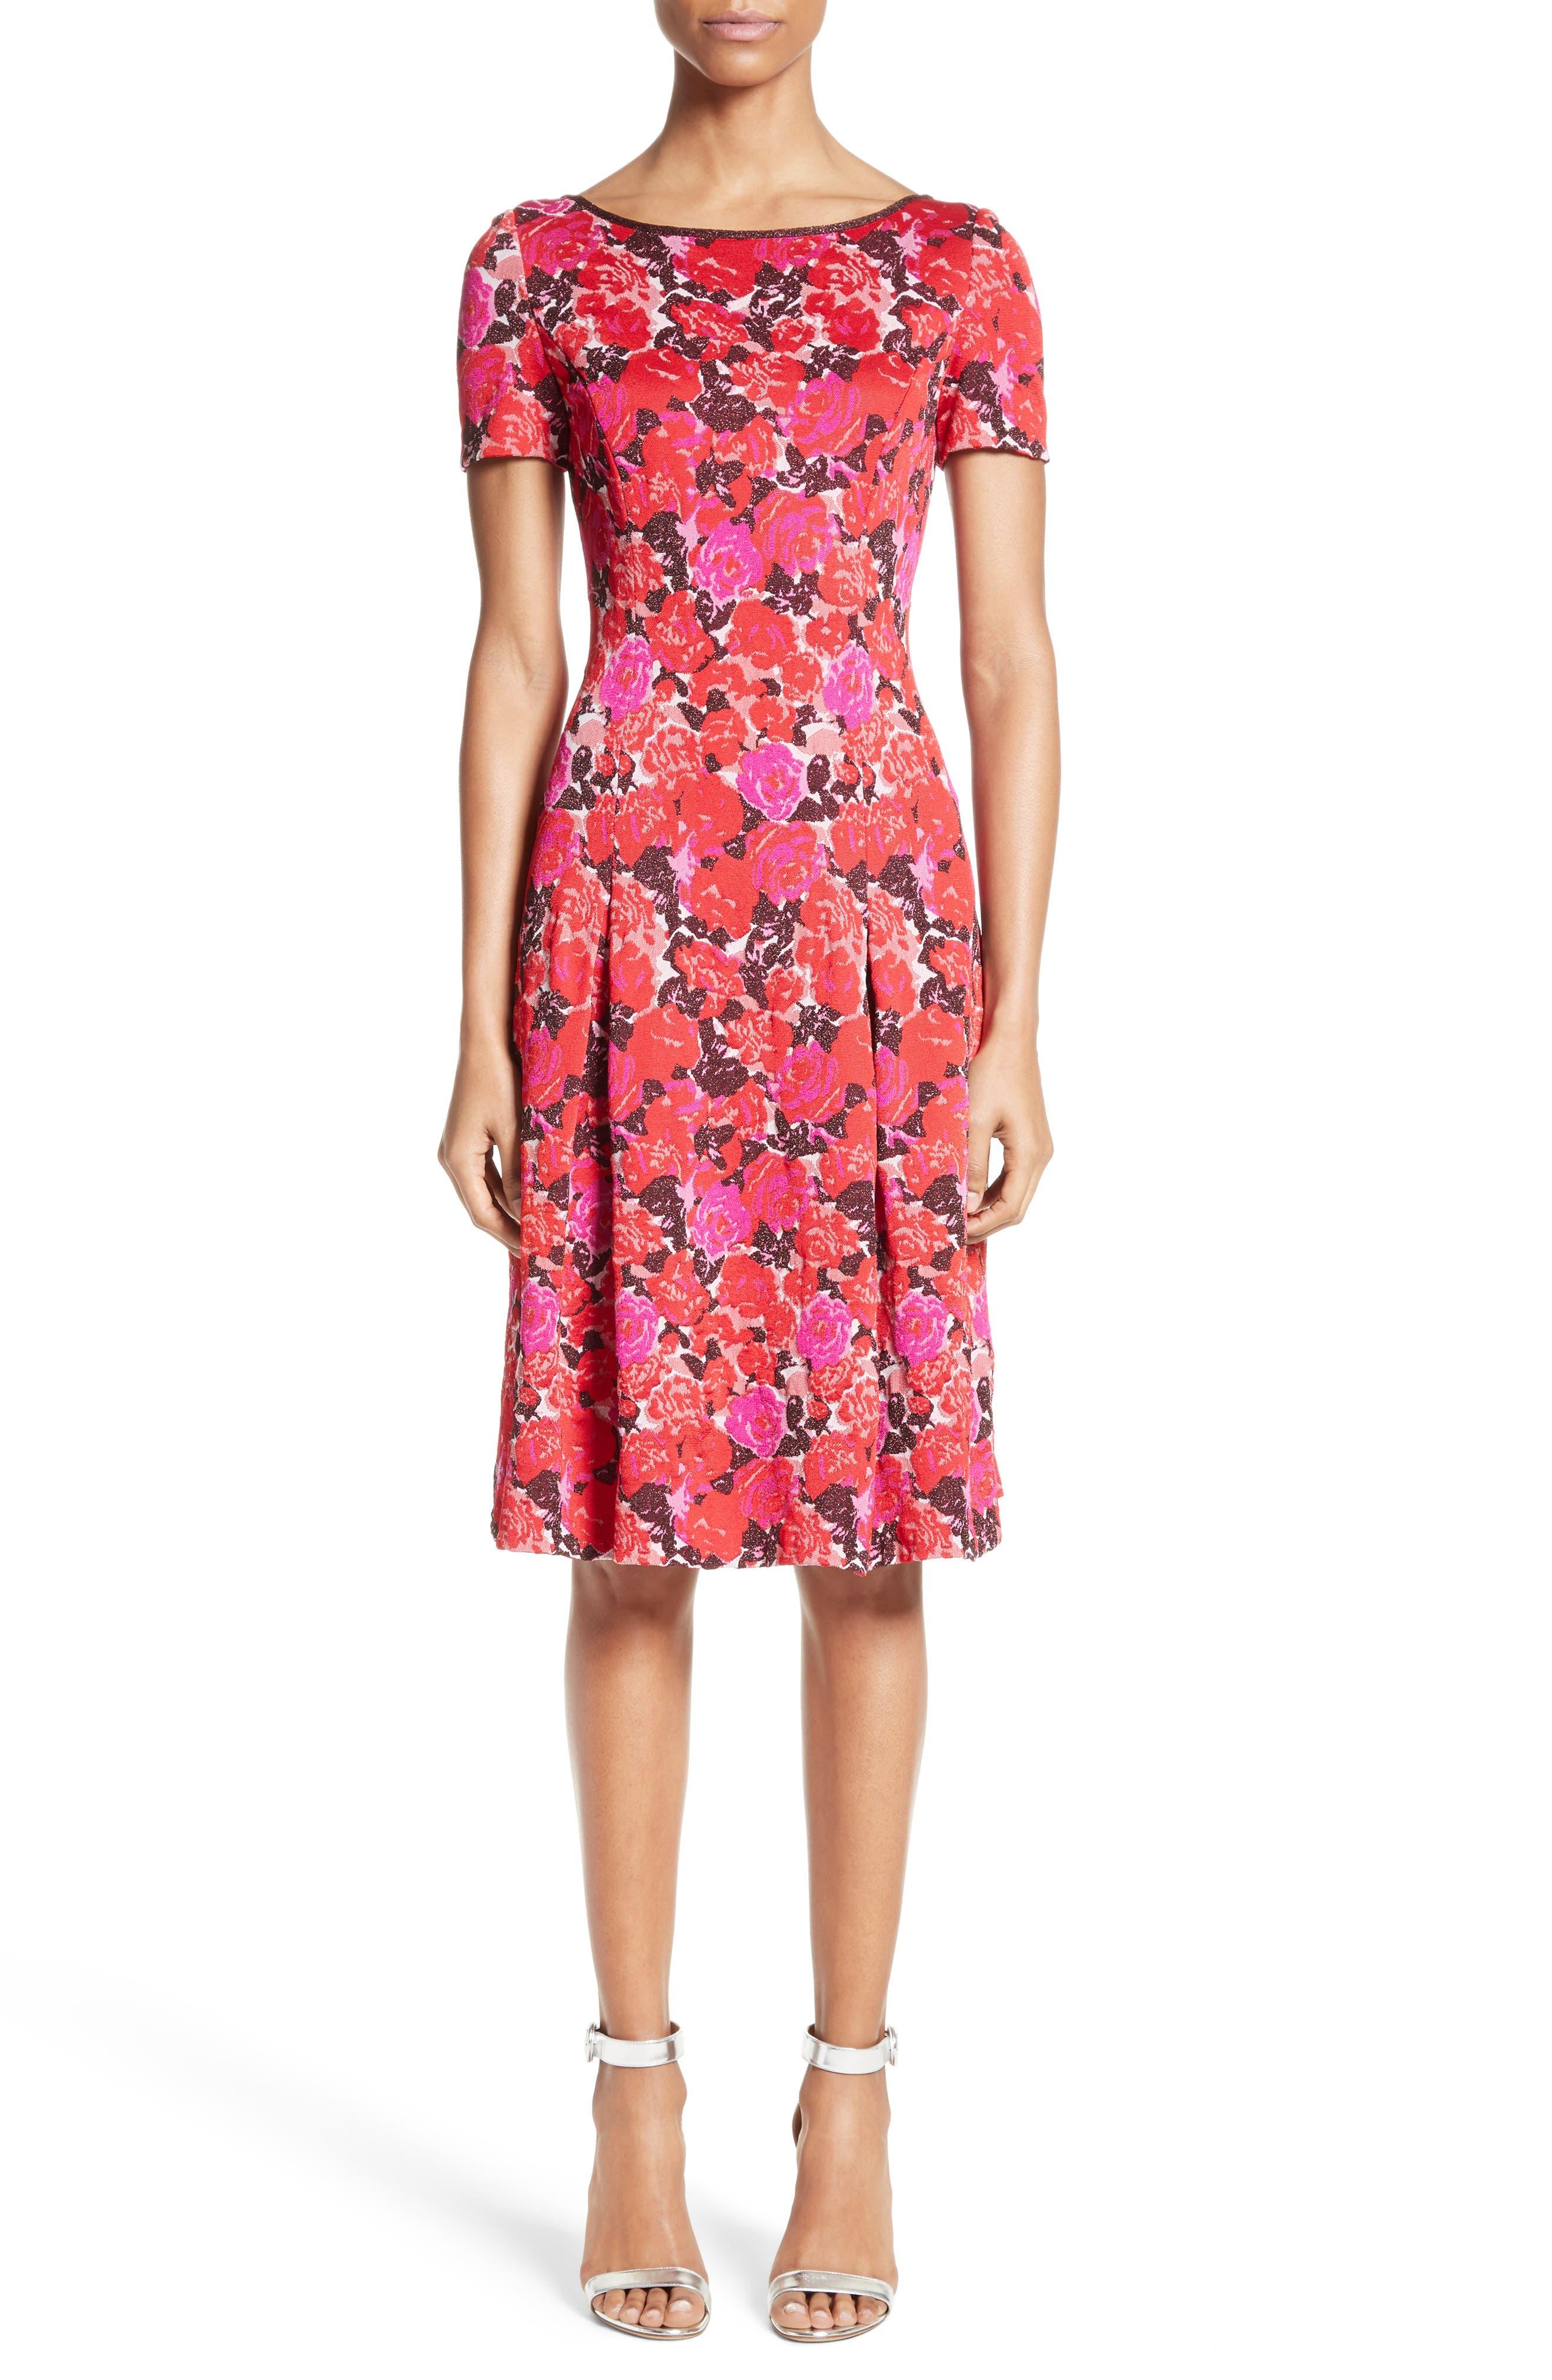 Main Image - St. John Collection Indian Rose Blister Jacquard Dress